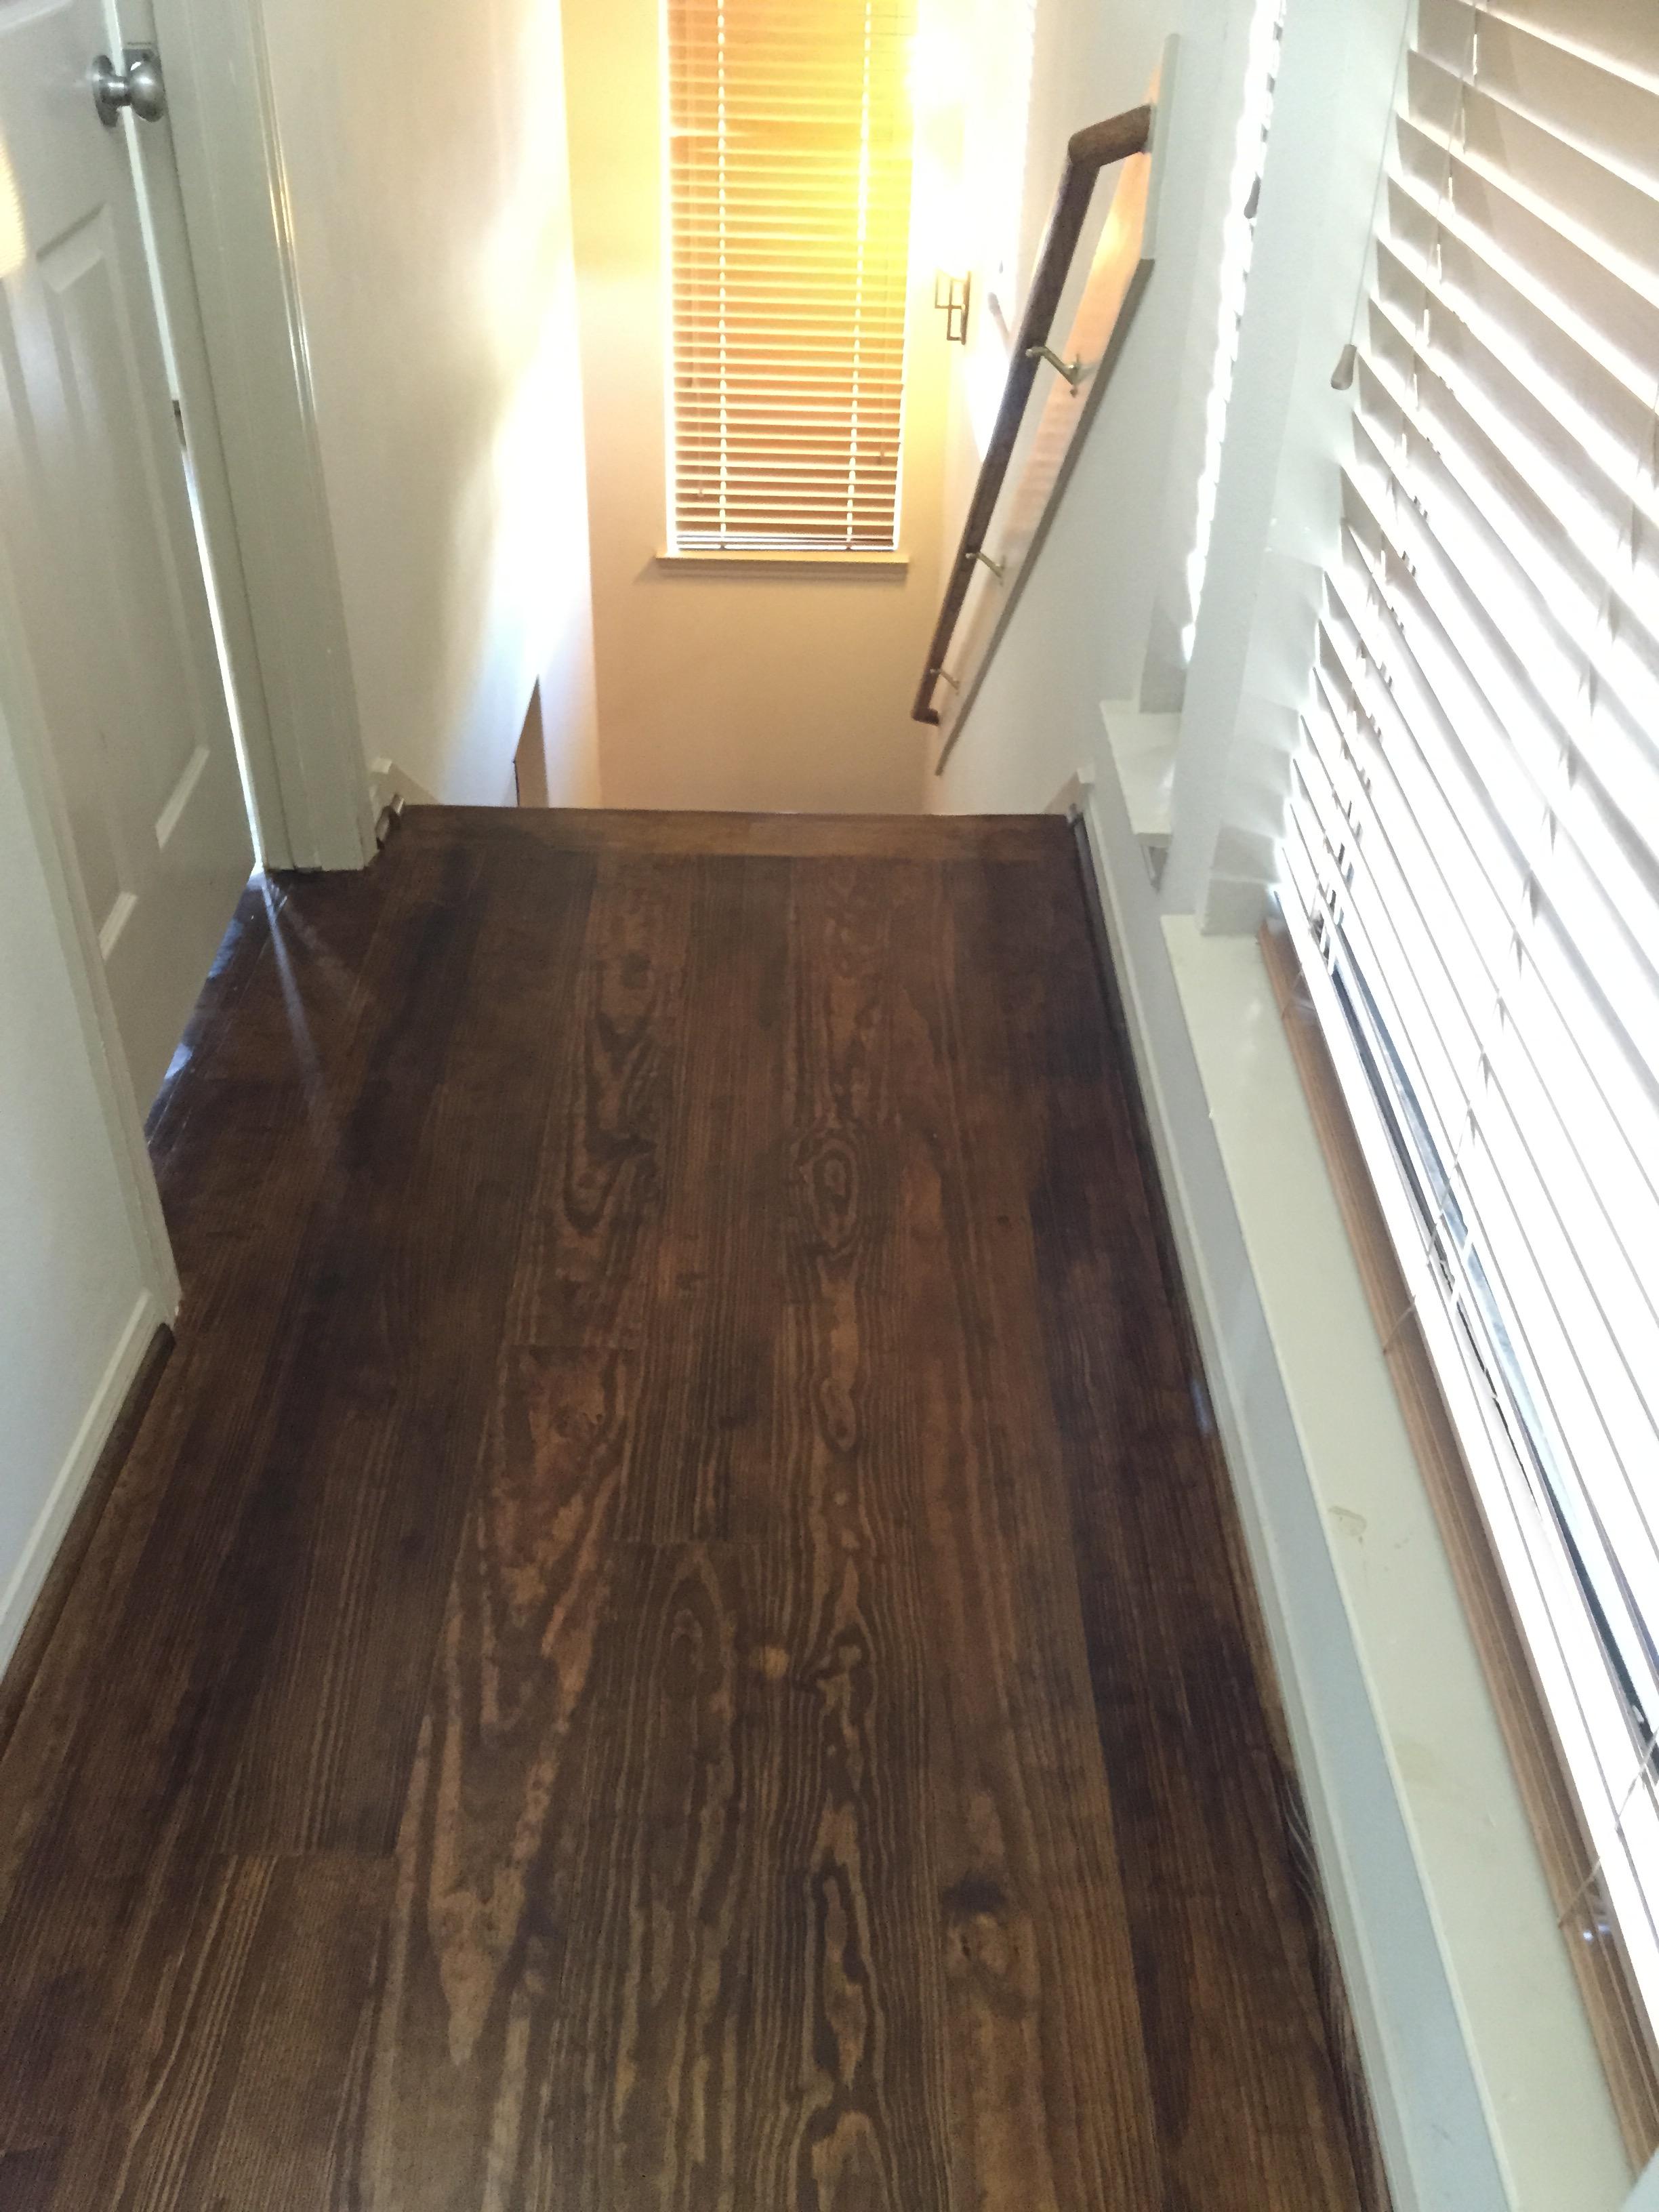 Gallery San Antonio Hardwood Floors Refinishing